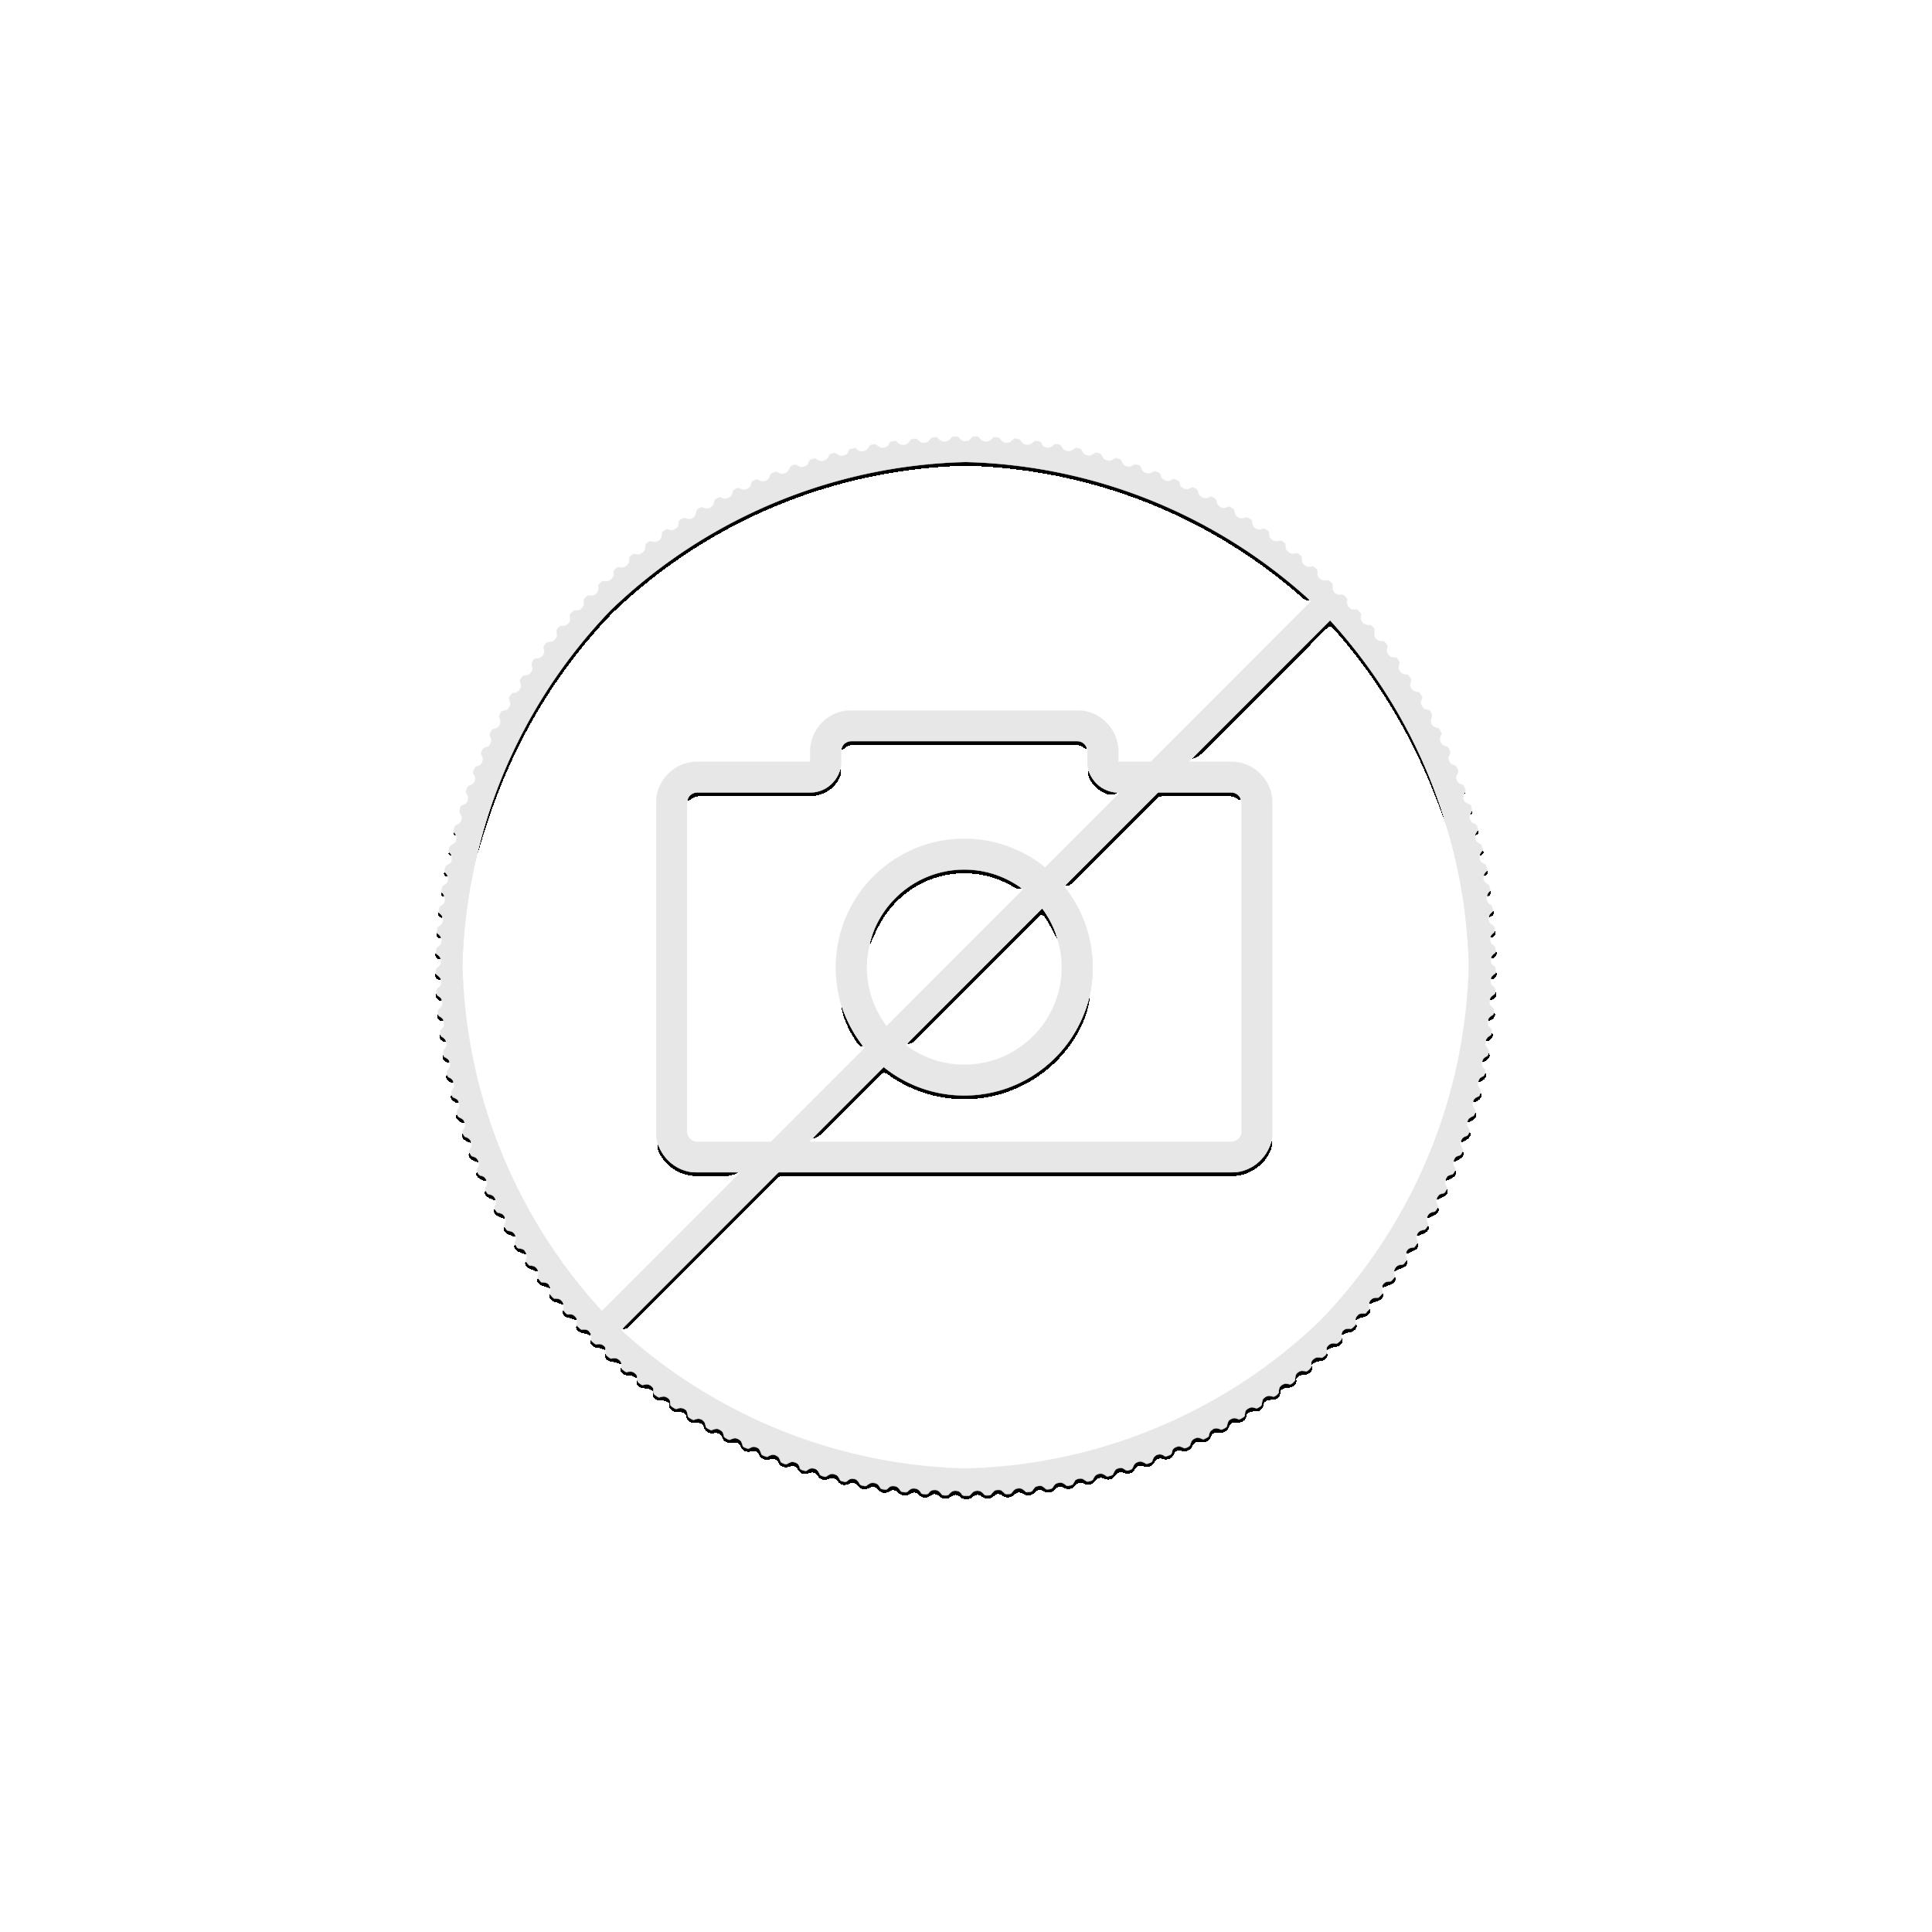 25x 1 gram gold bar Pamp Suisse